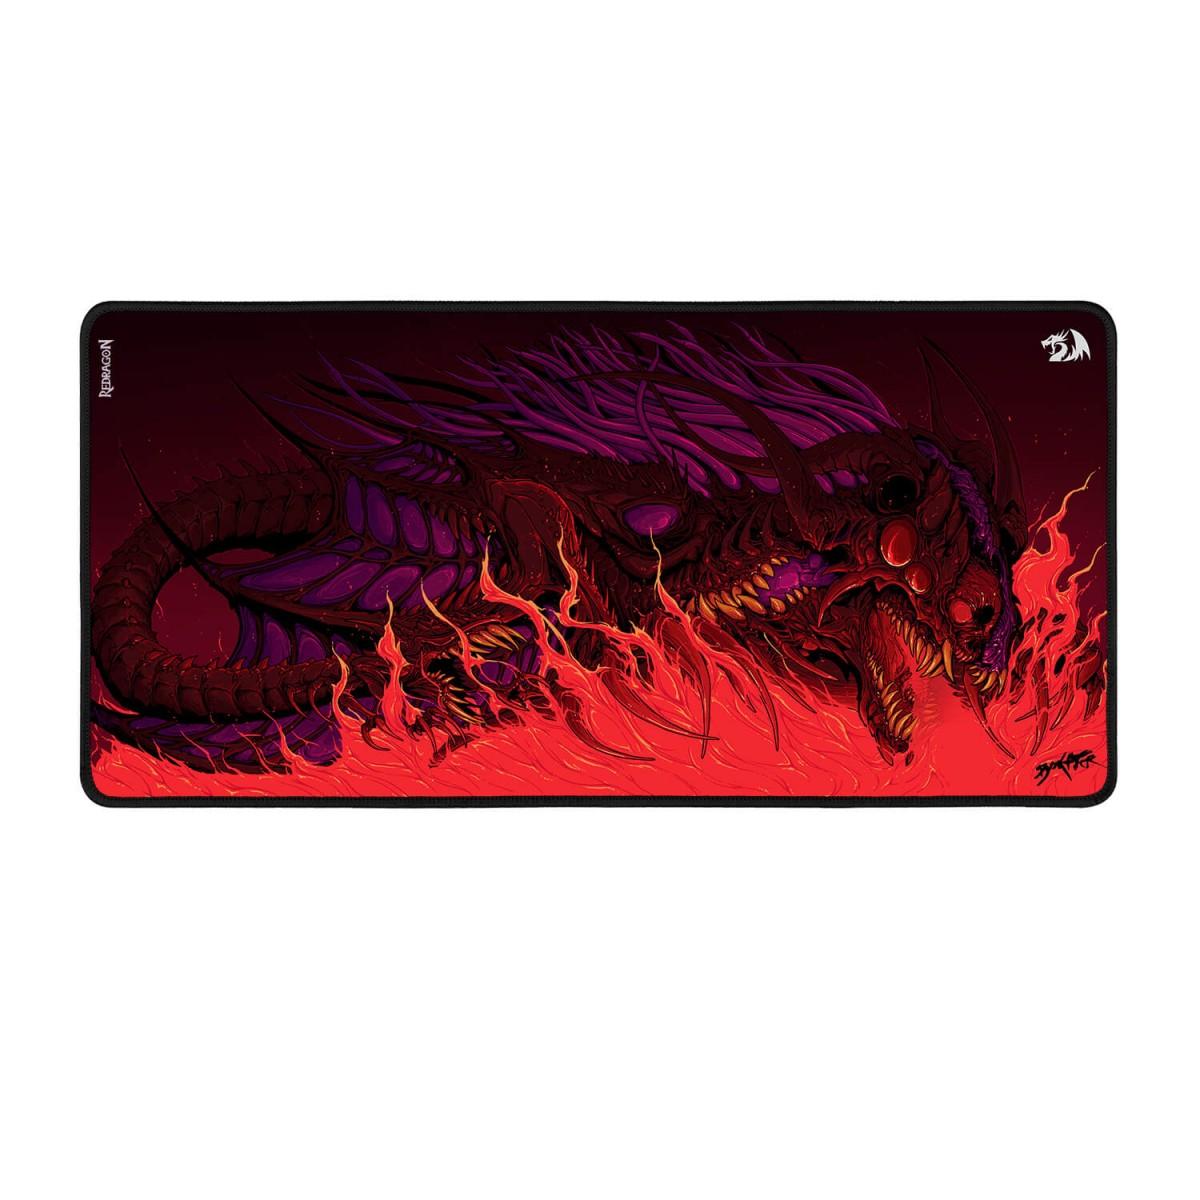 Mousepad Gamer ReDragon Infernal Dragon Seiryu, 880x420mm, ID006